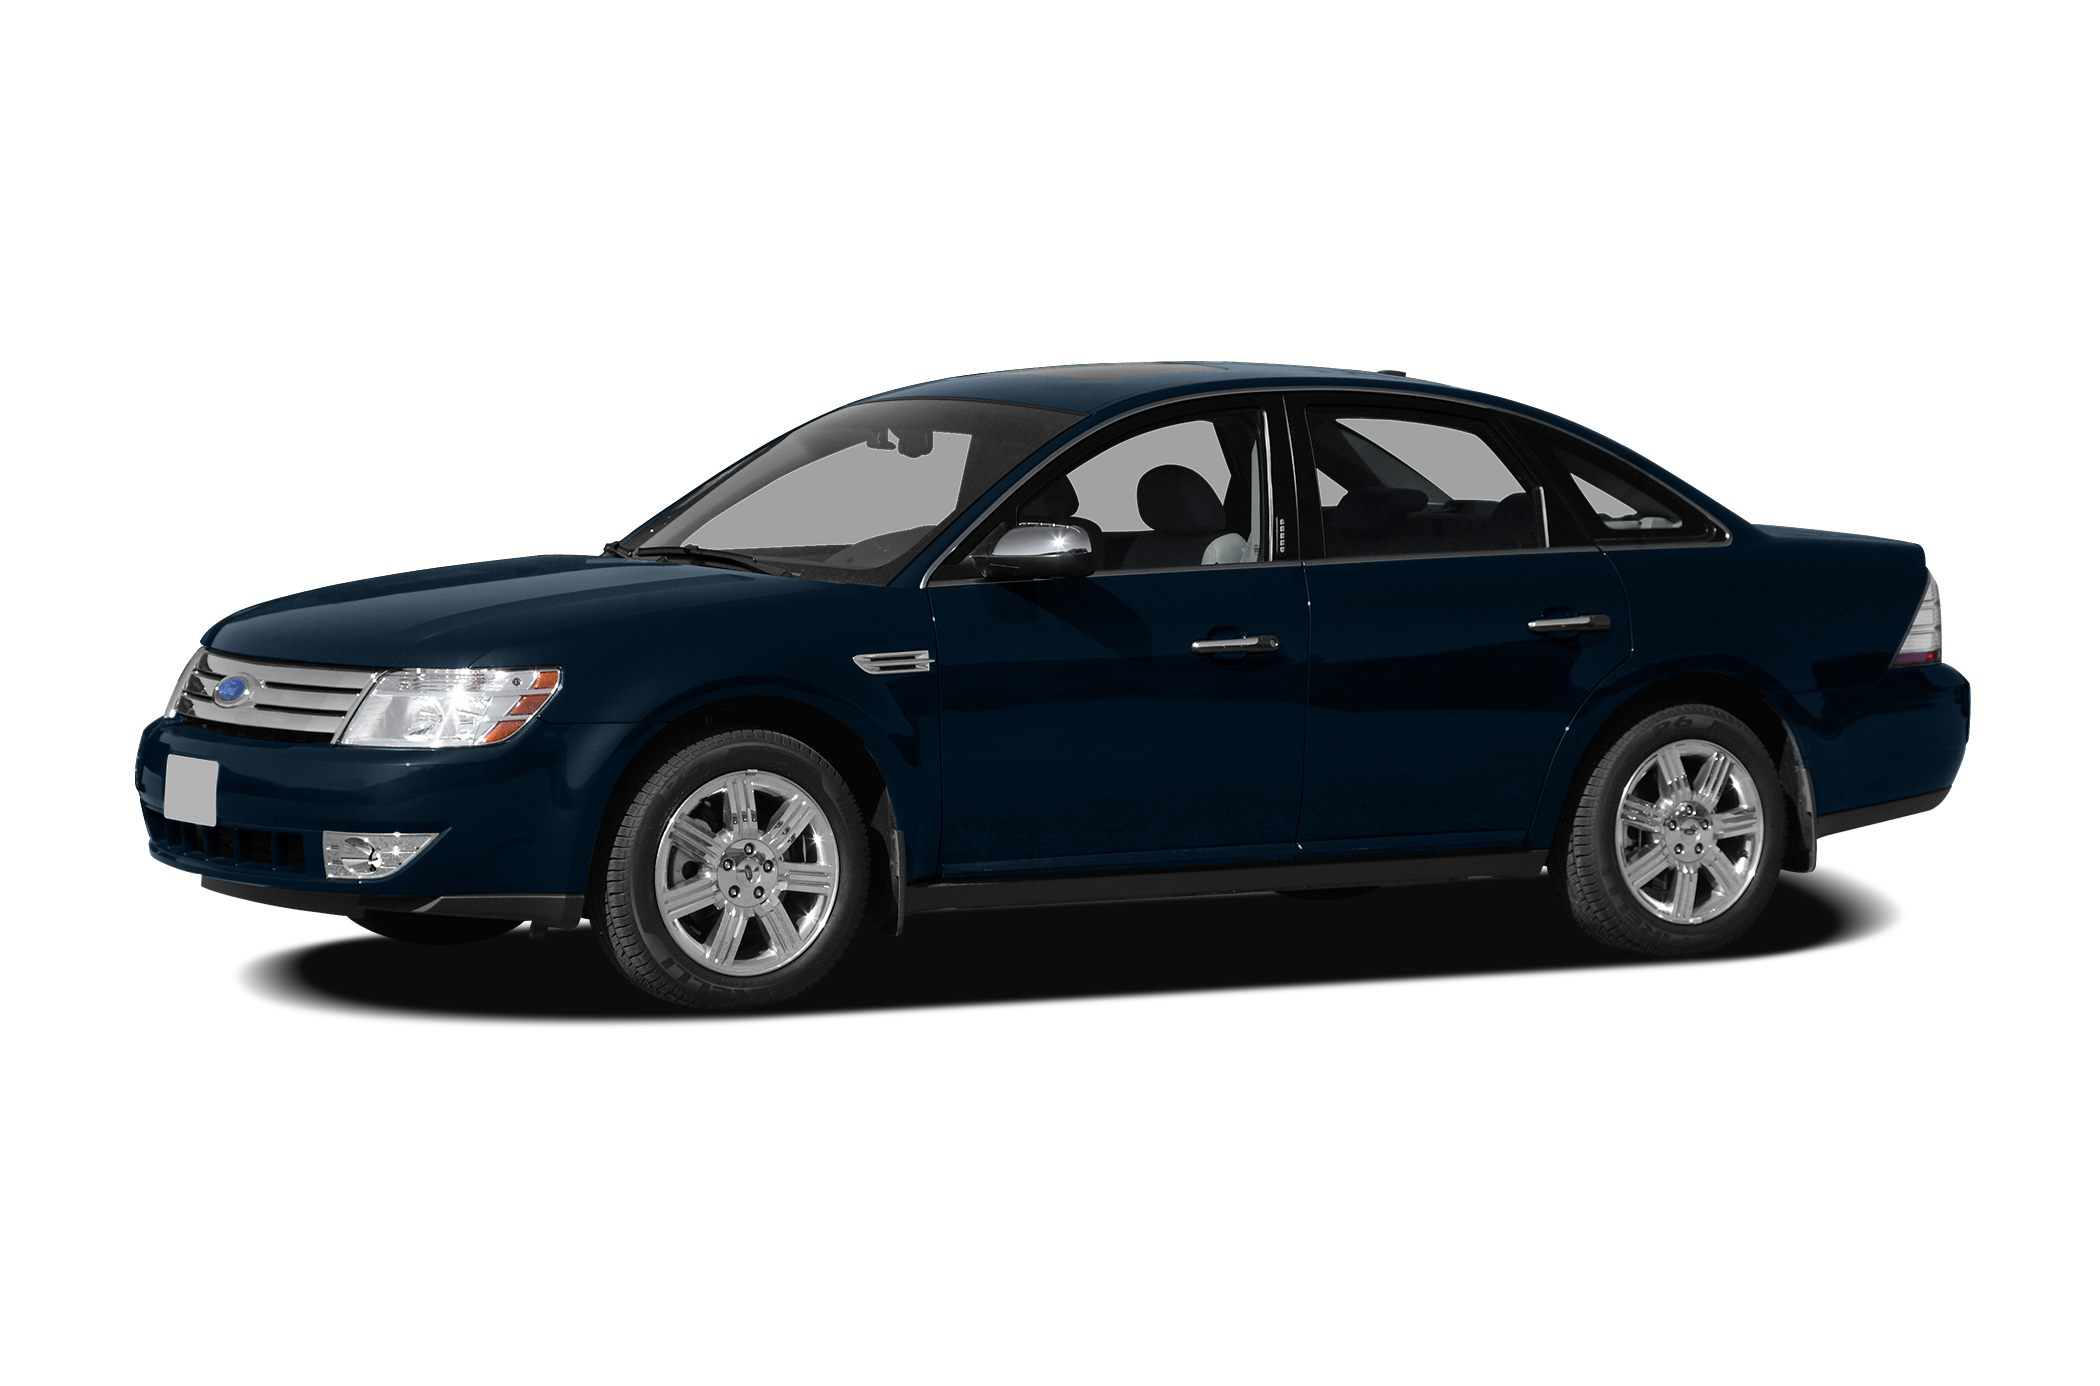 2009 Ford Taurus SEL 5 Star Driver Front Crash Rating 12000 Mile Warranty SEL trim Consumer Gui